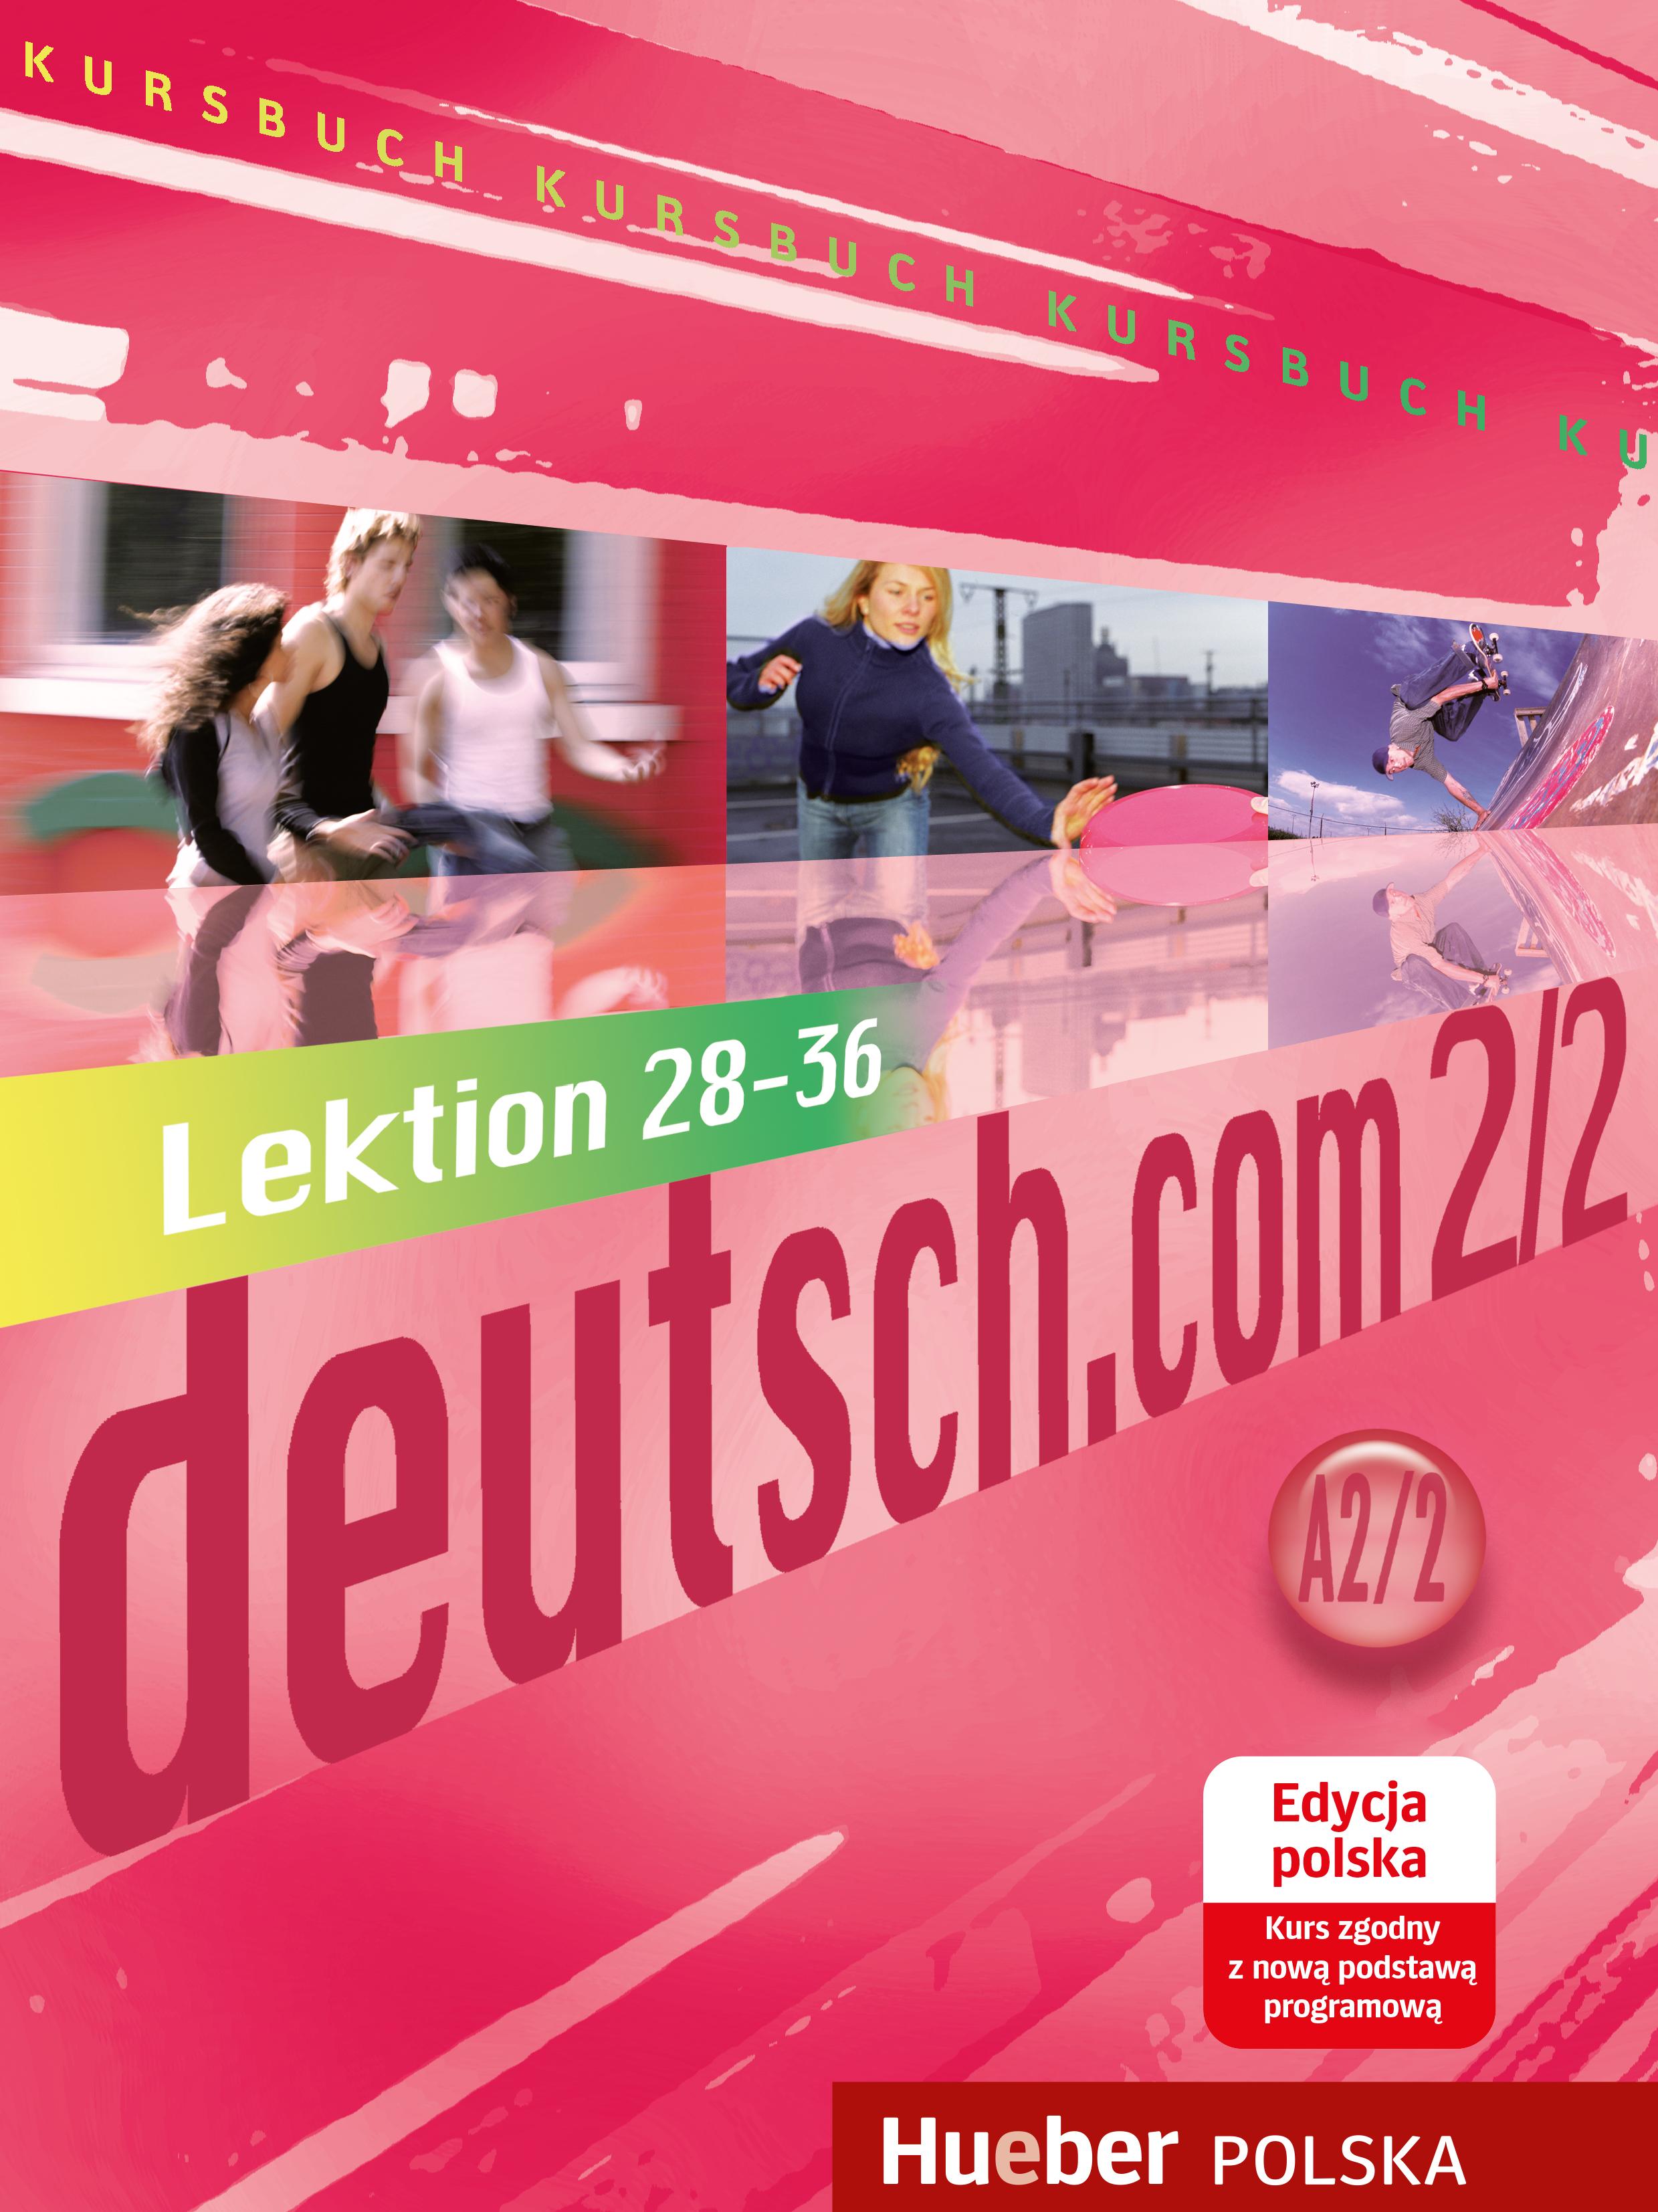 deutsch.com 2/2 Edycja polska